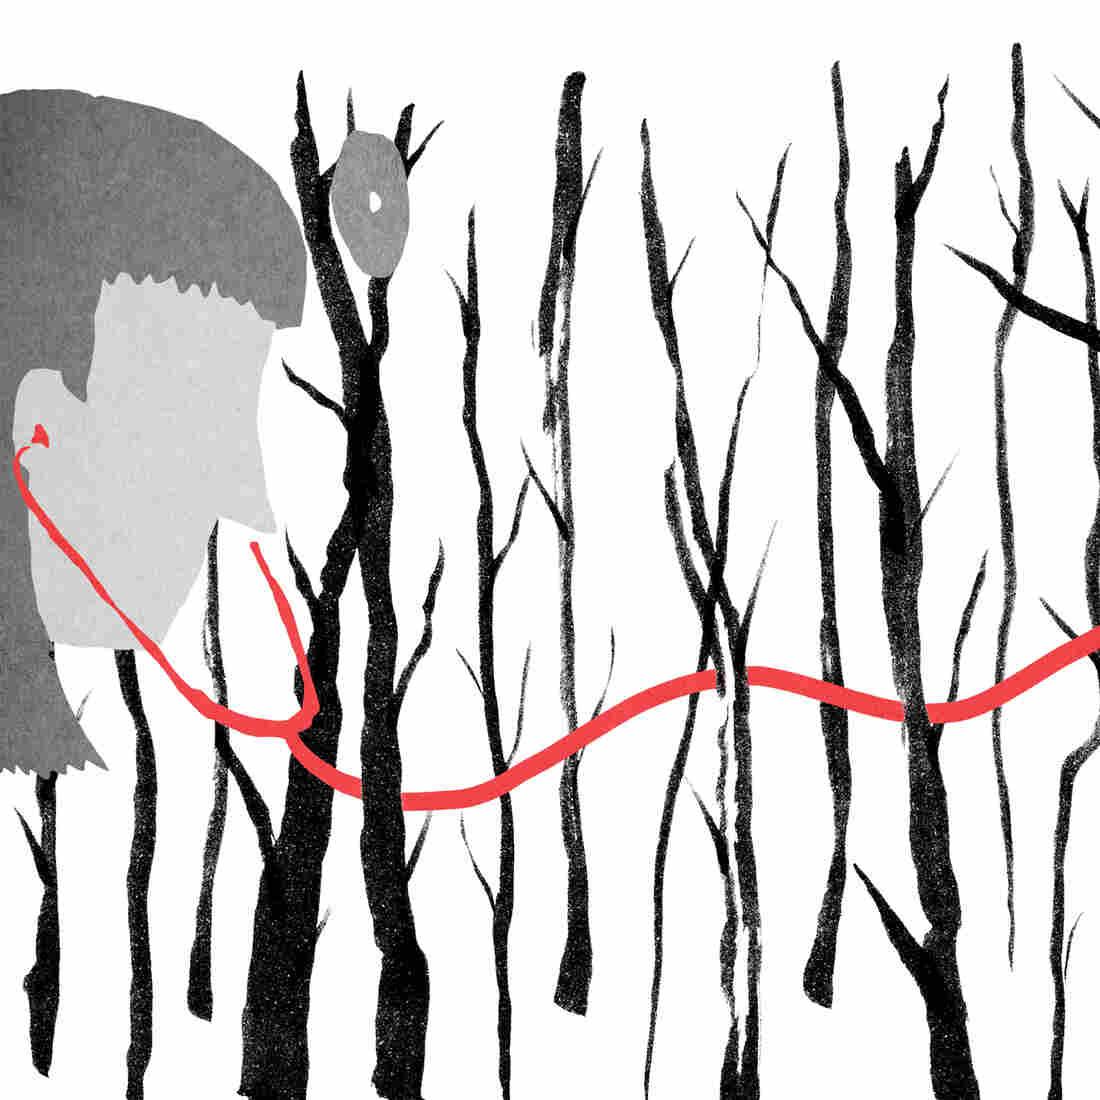 Illustration by Daniel Horowitz for NPR